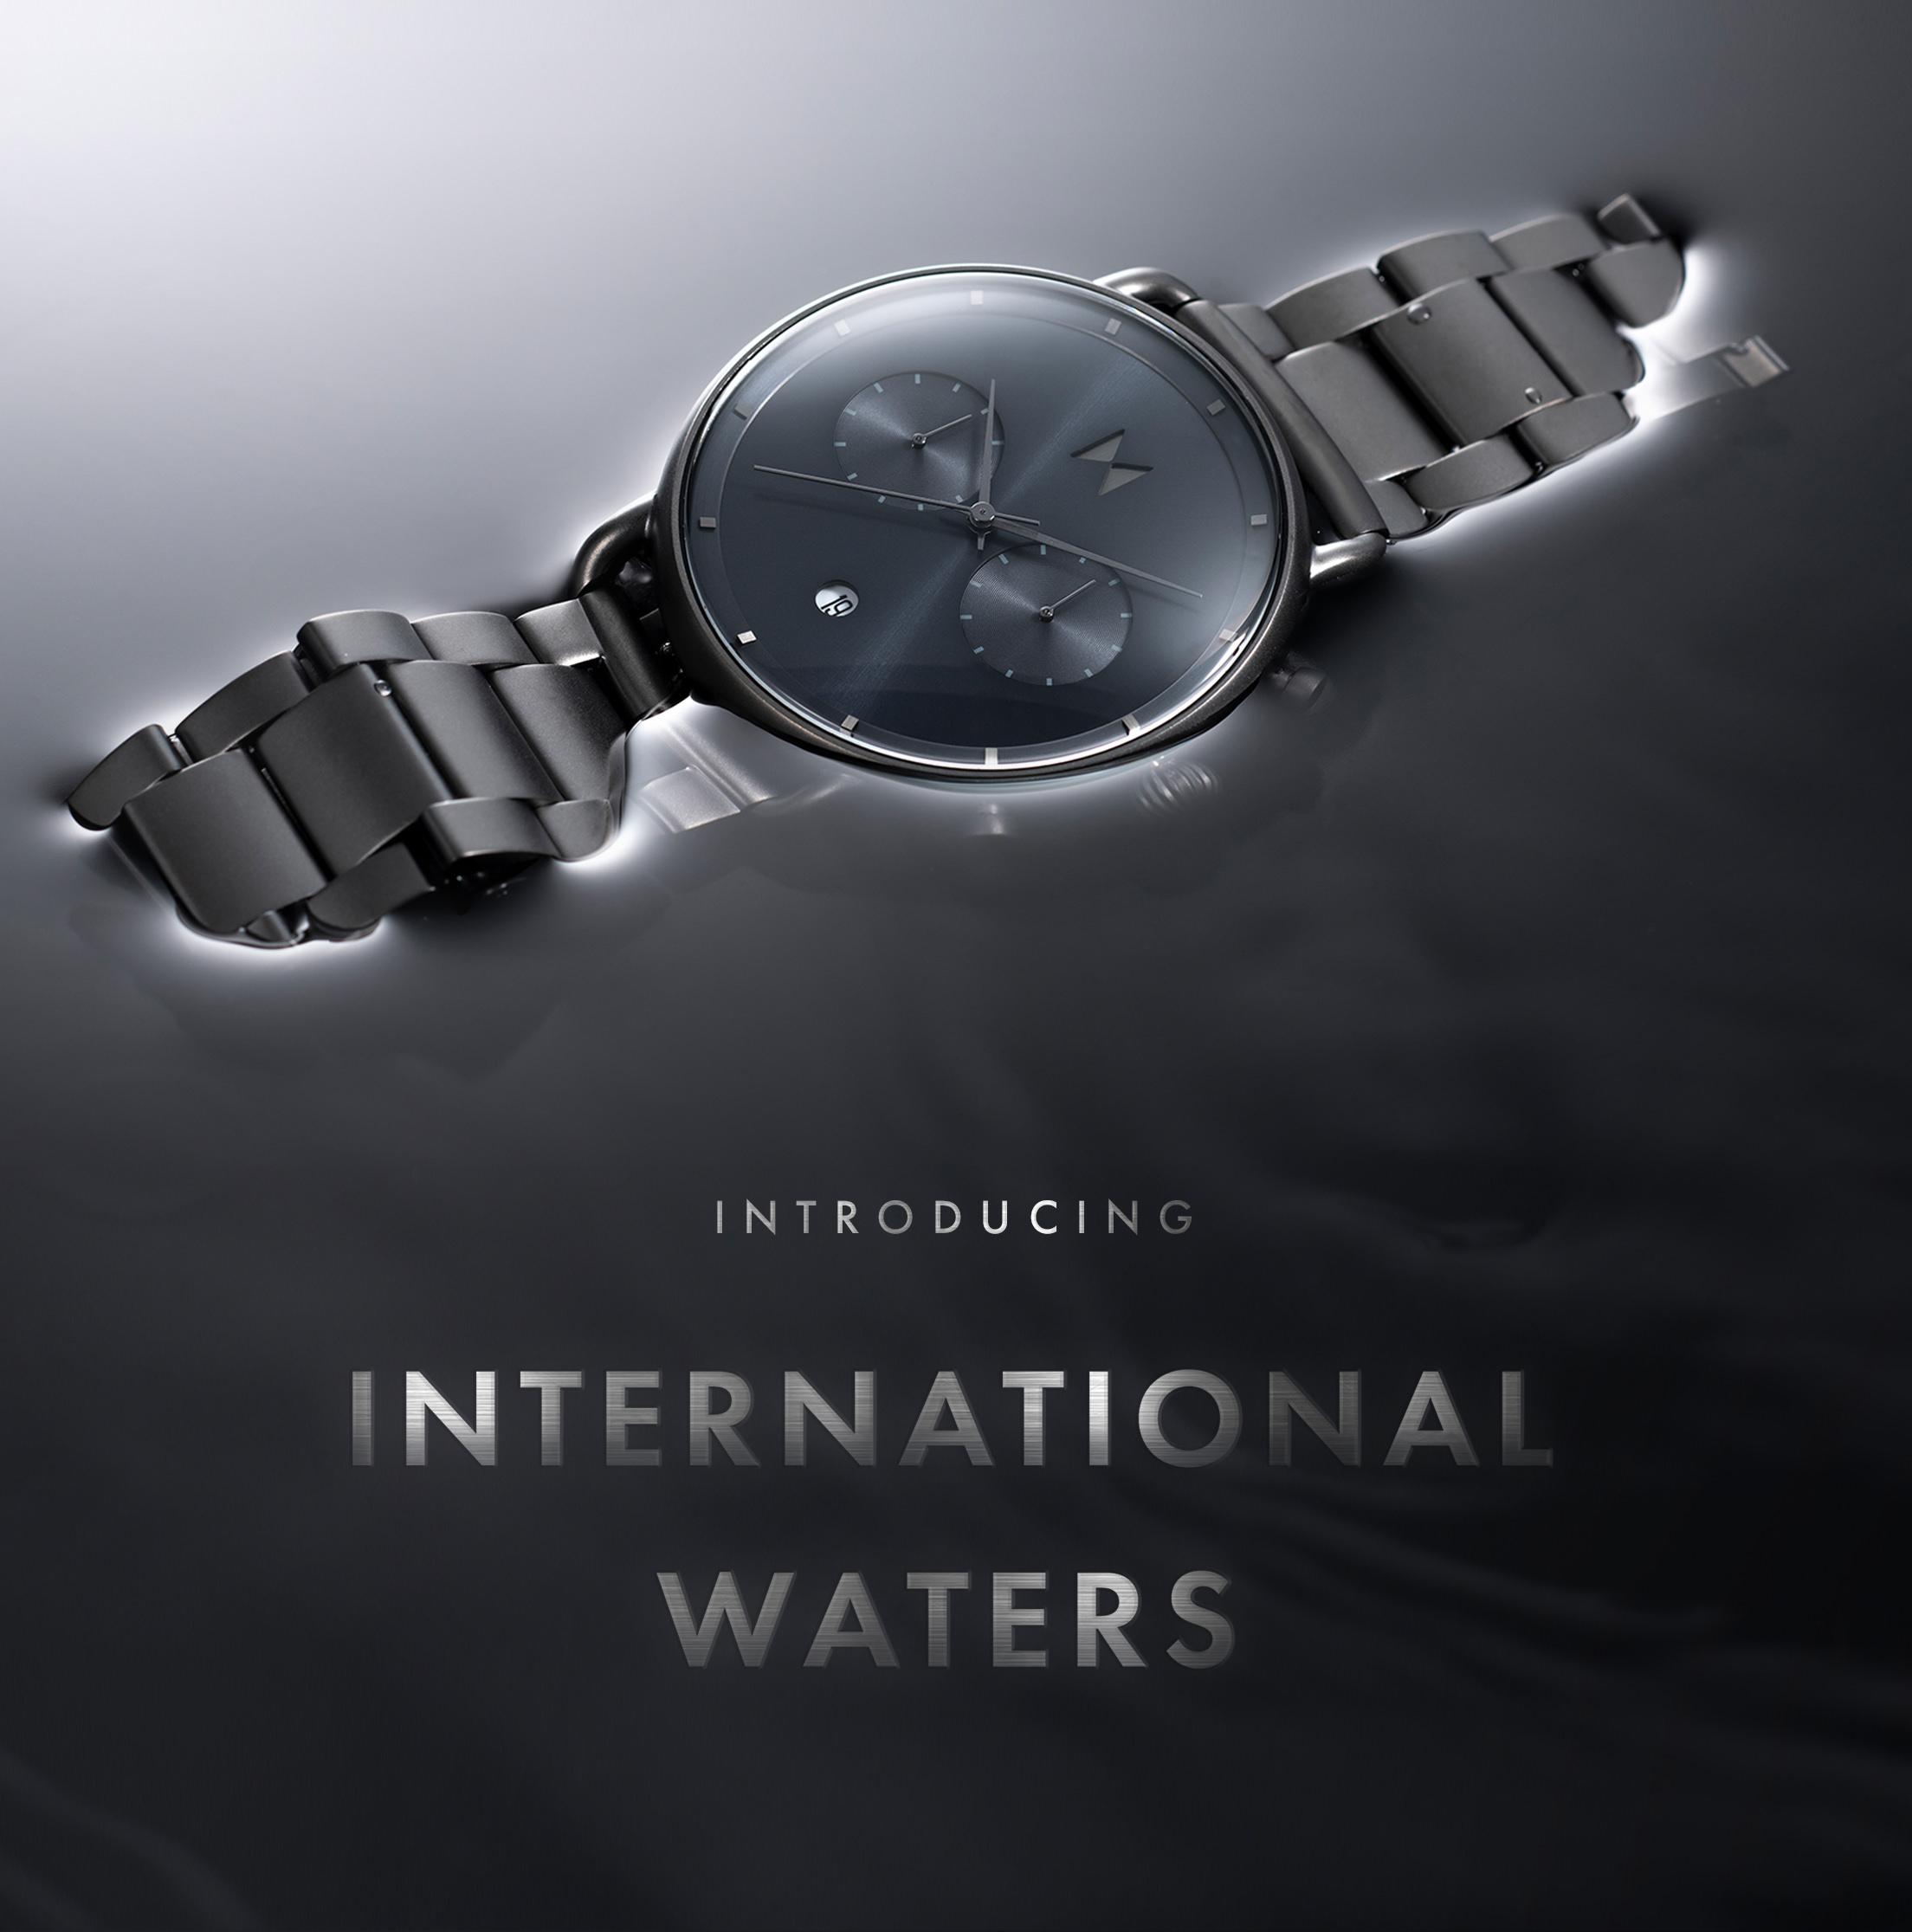 Introducing International Waters